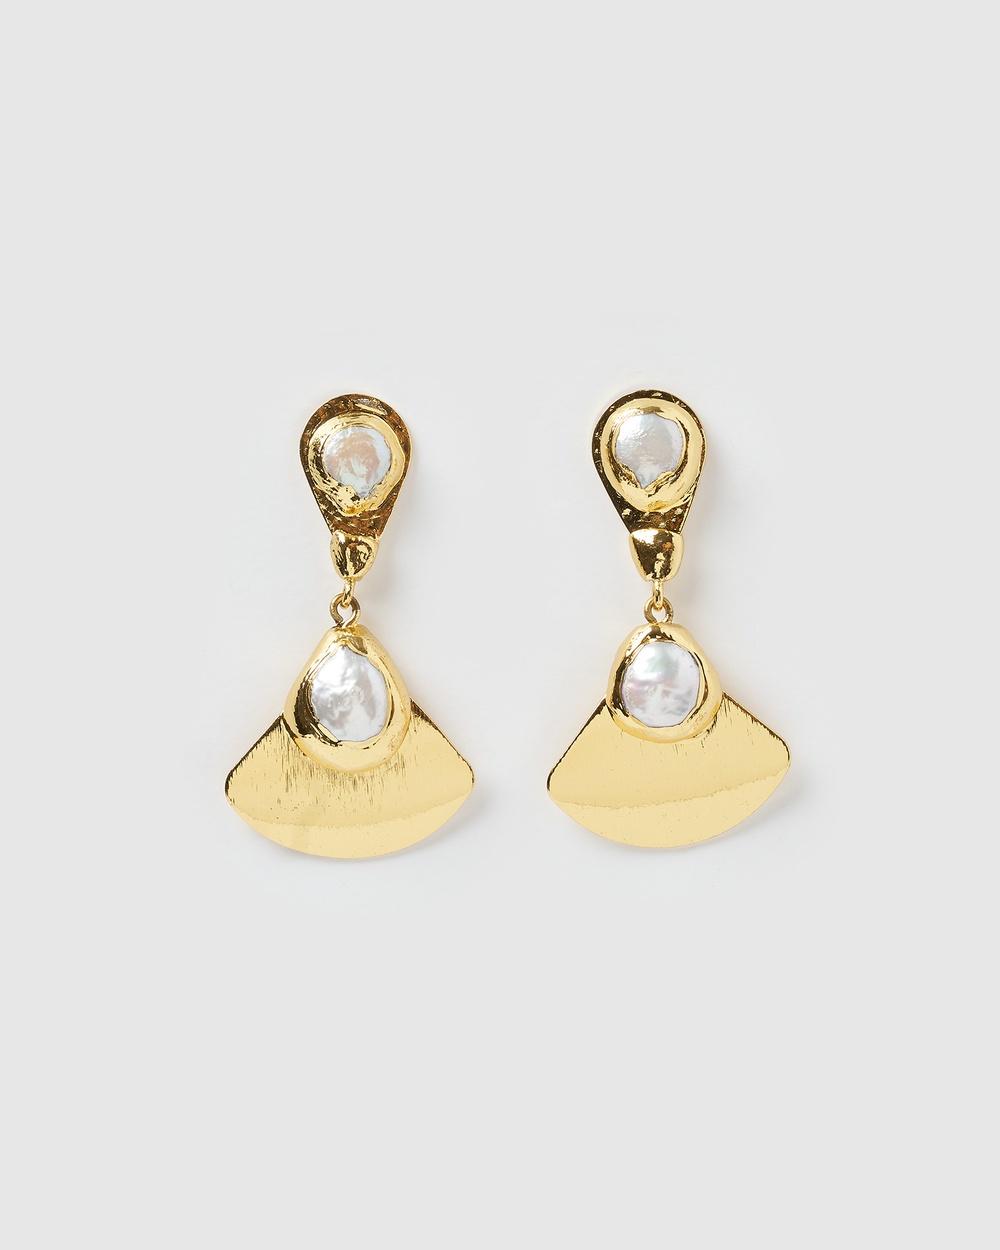 Miz Casa and Co Malia Earrings Jewellery Gold Freshwater Pearl